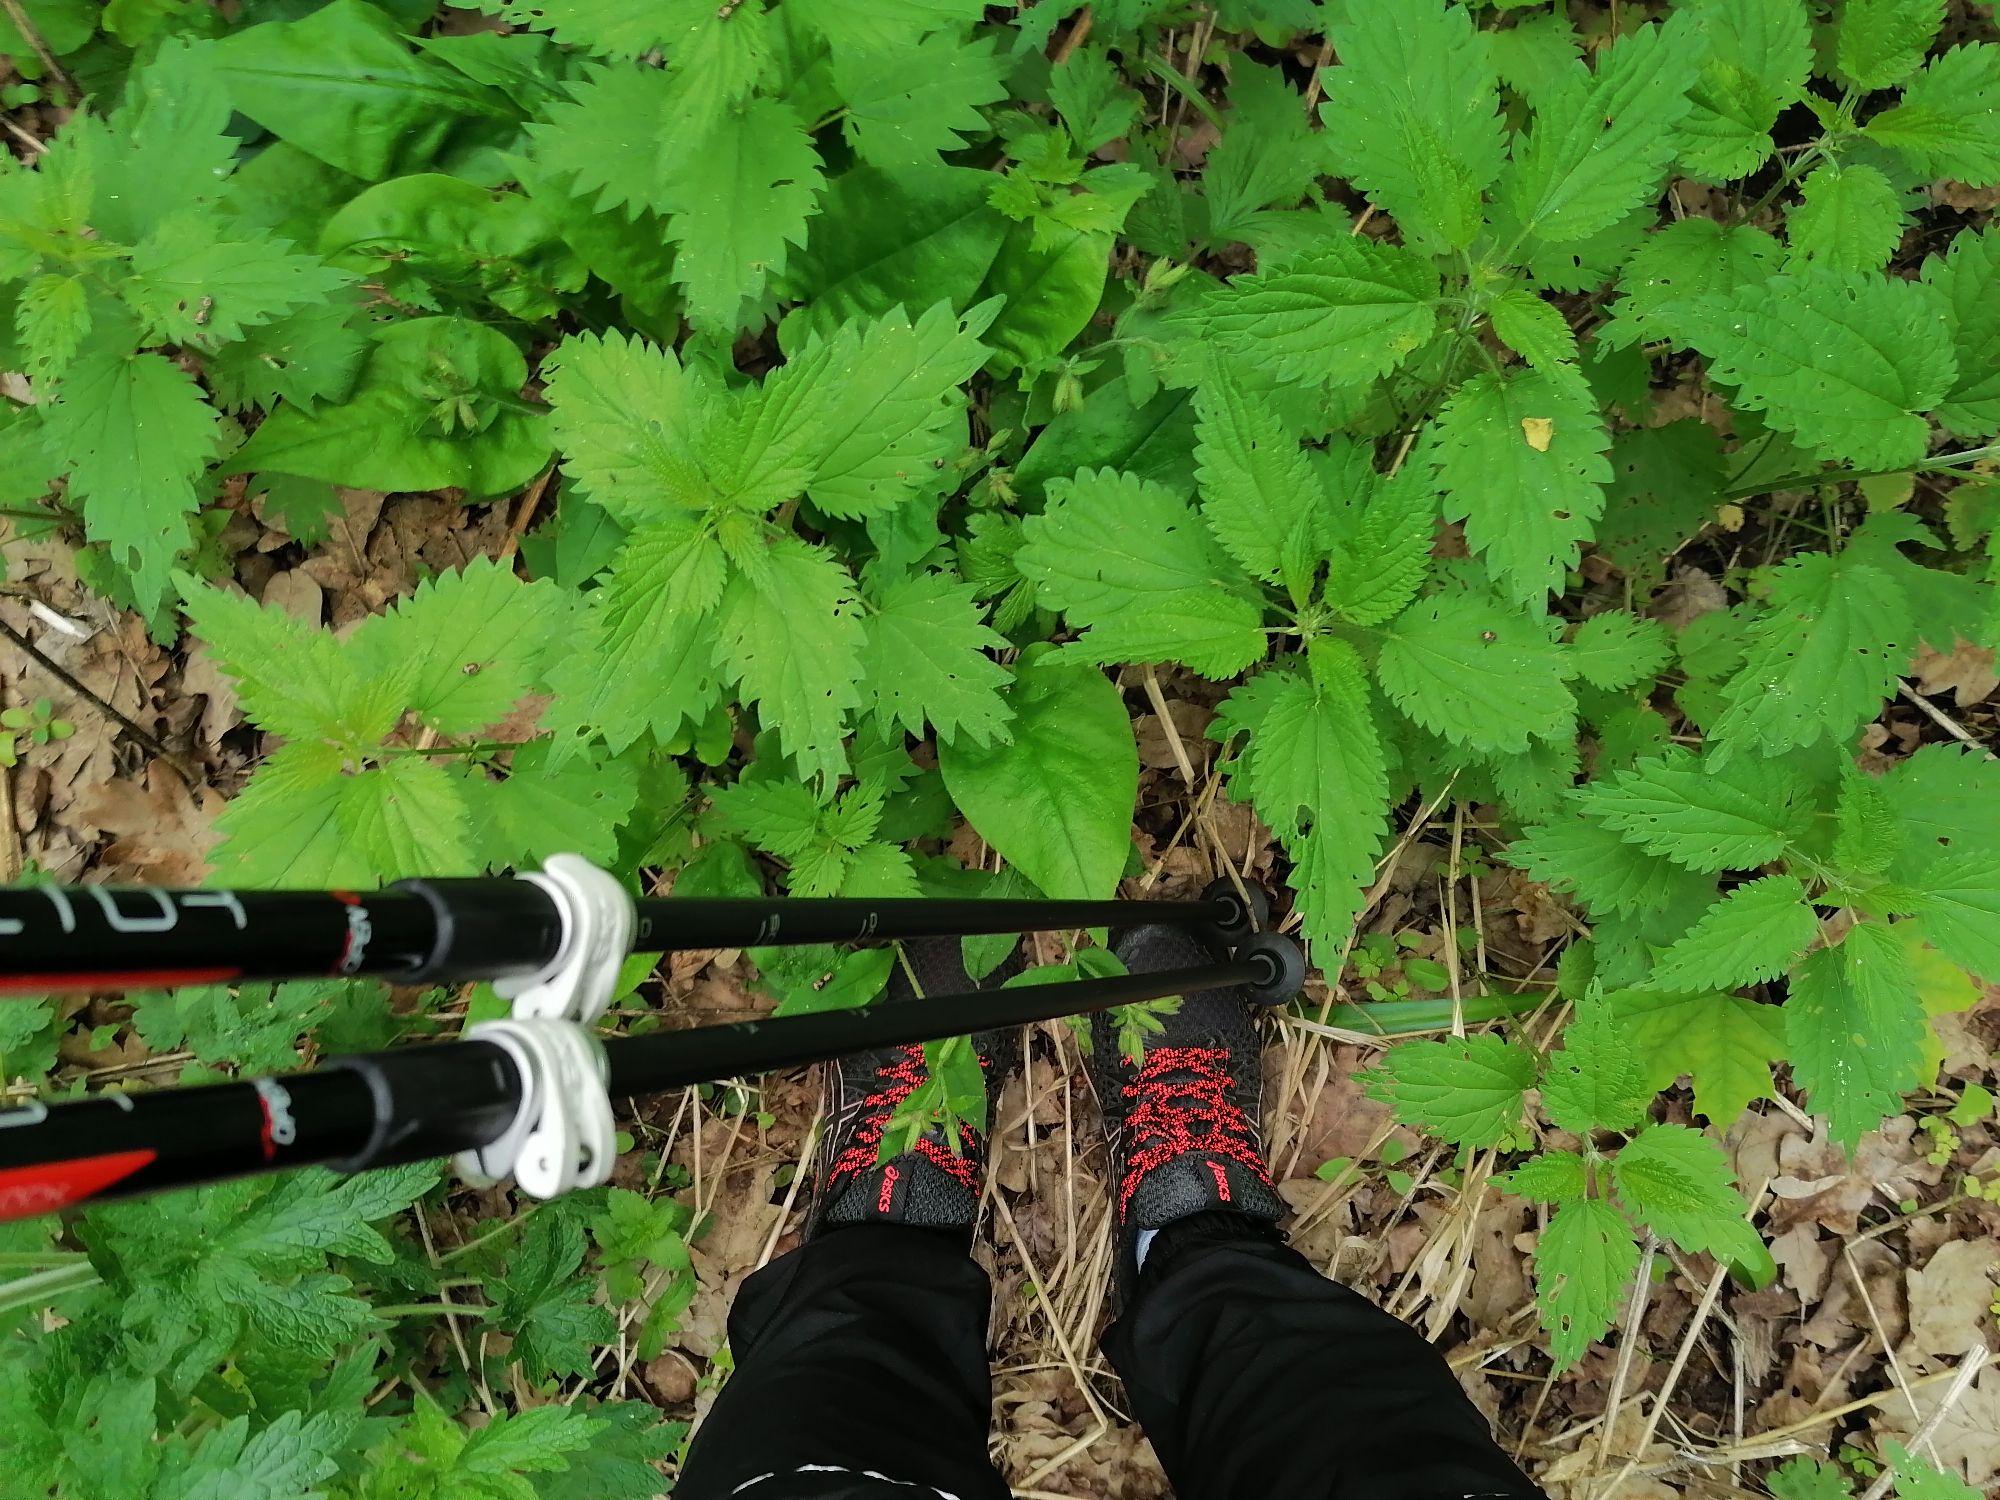 Ноги в траве. Ну и палки, конечно!